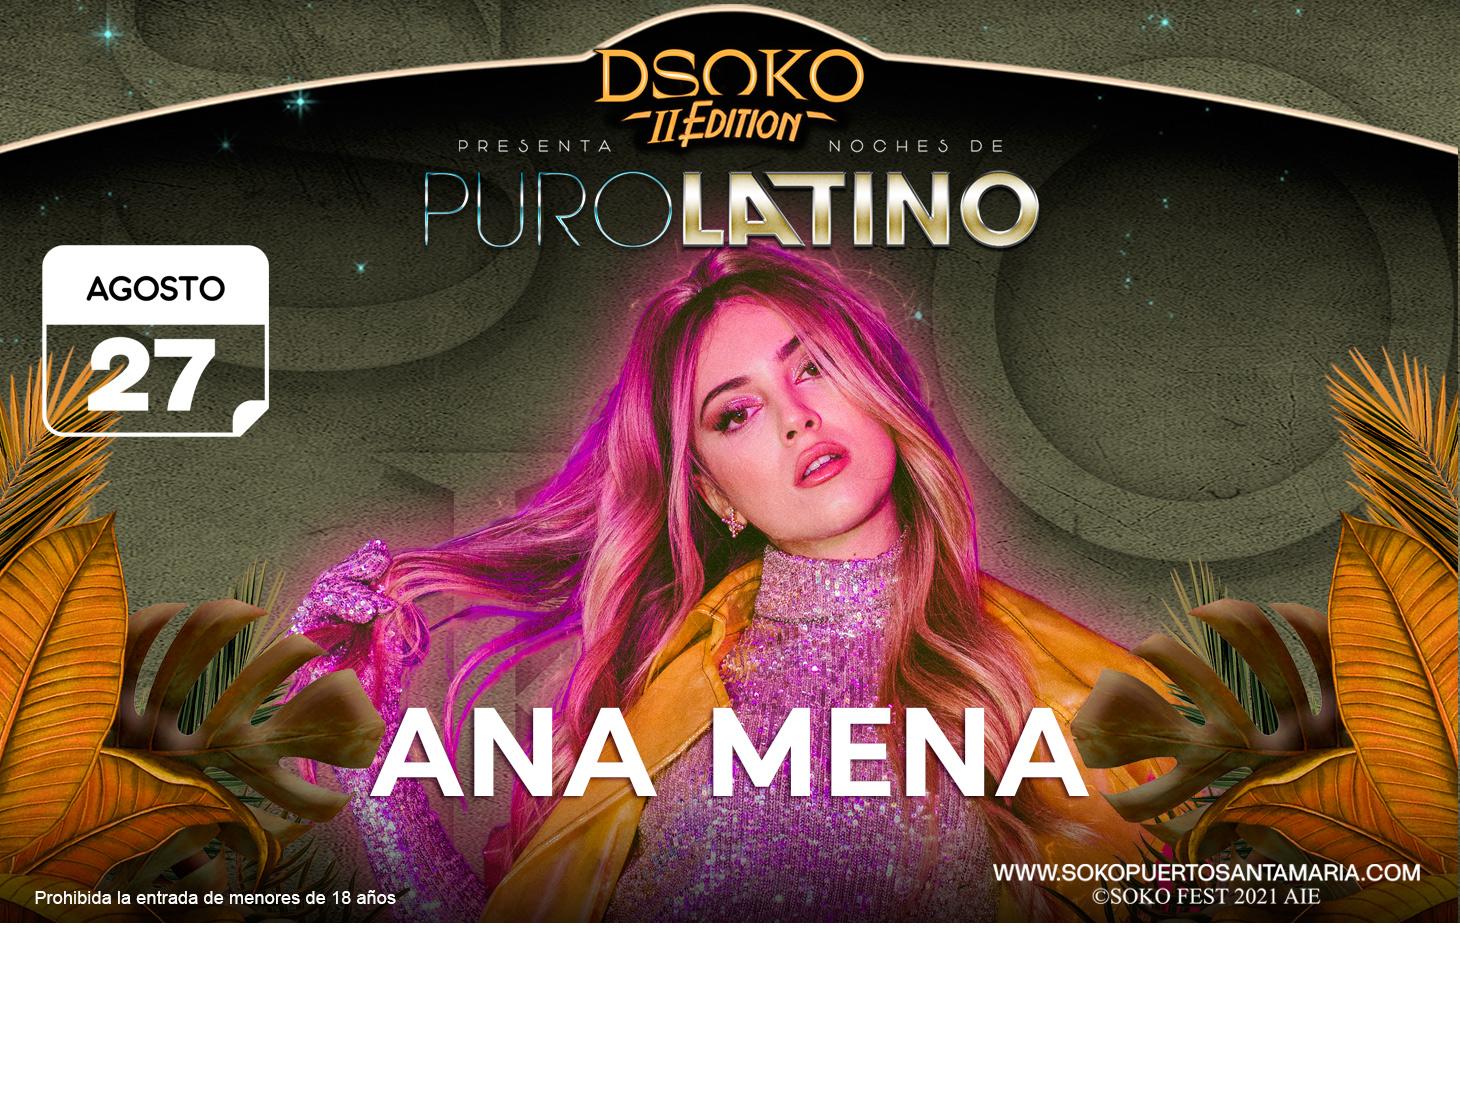 ana-mena-soko-fest-viernes-27-agosto-6094086460e0f.jpeg